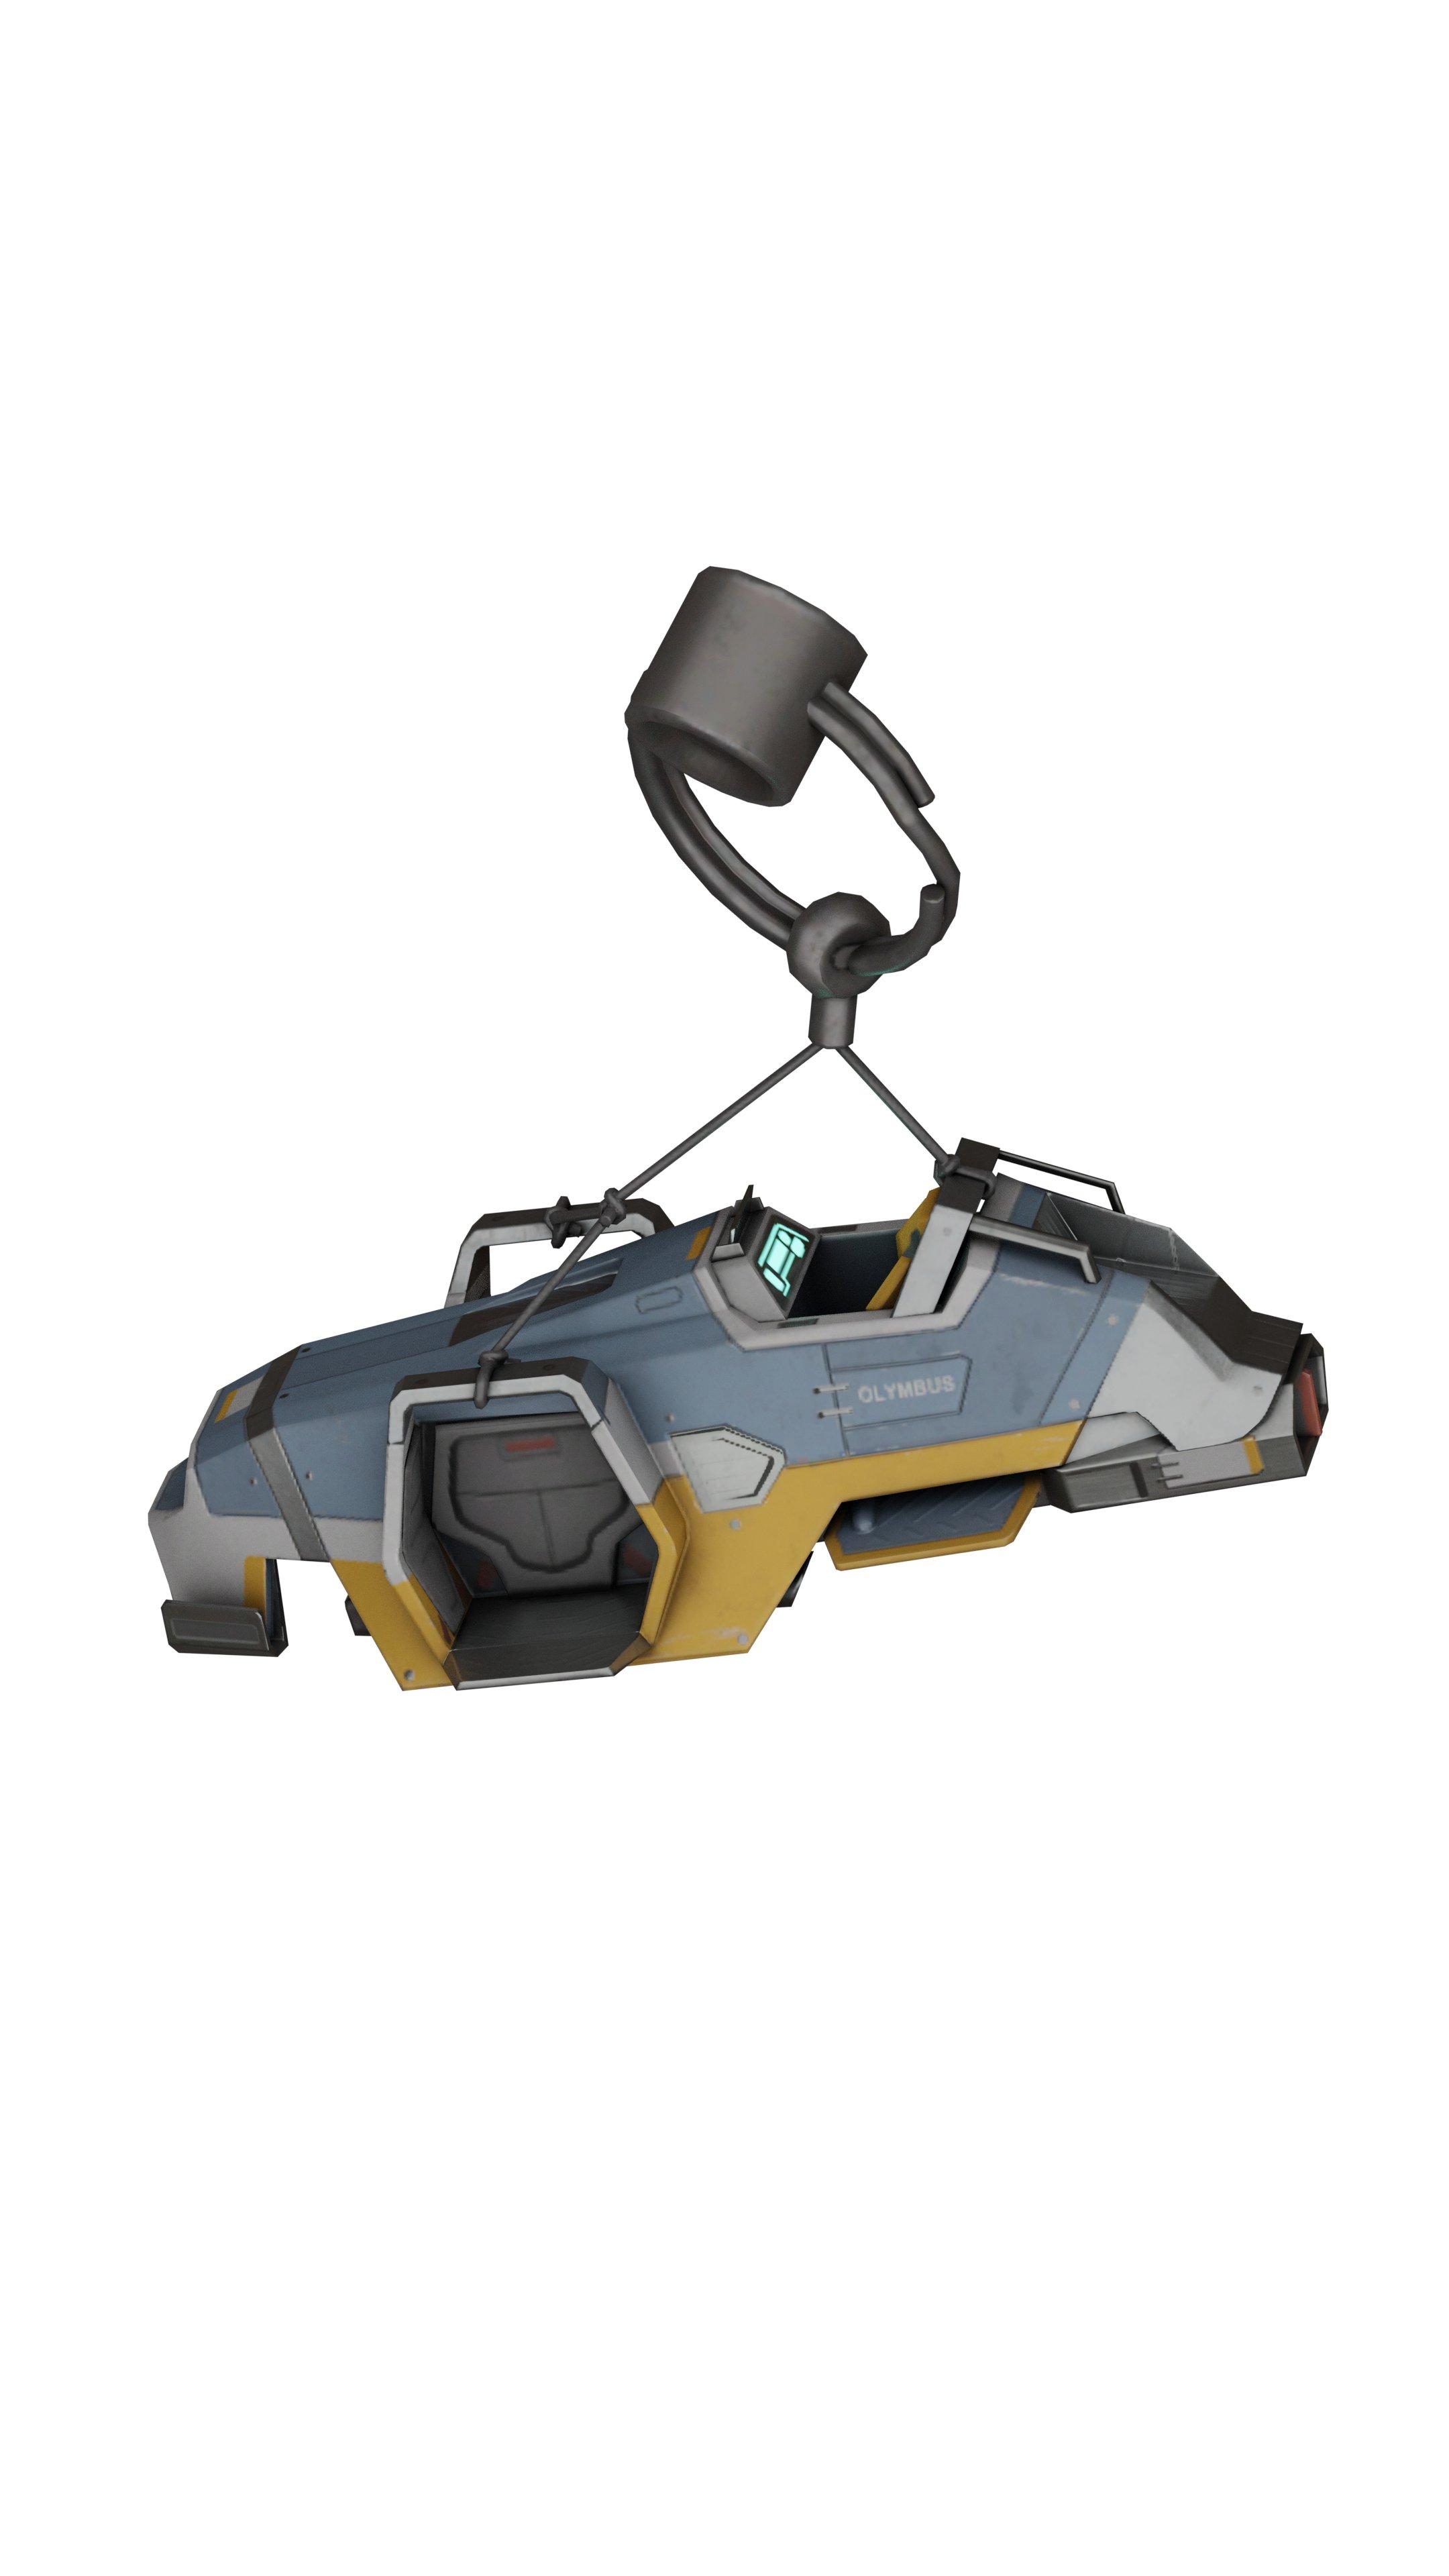 Hovercraft reward